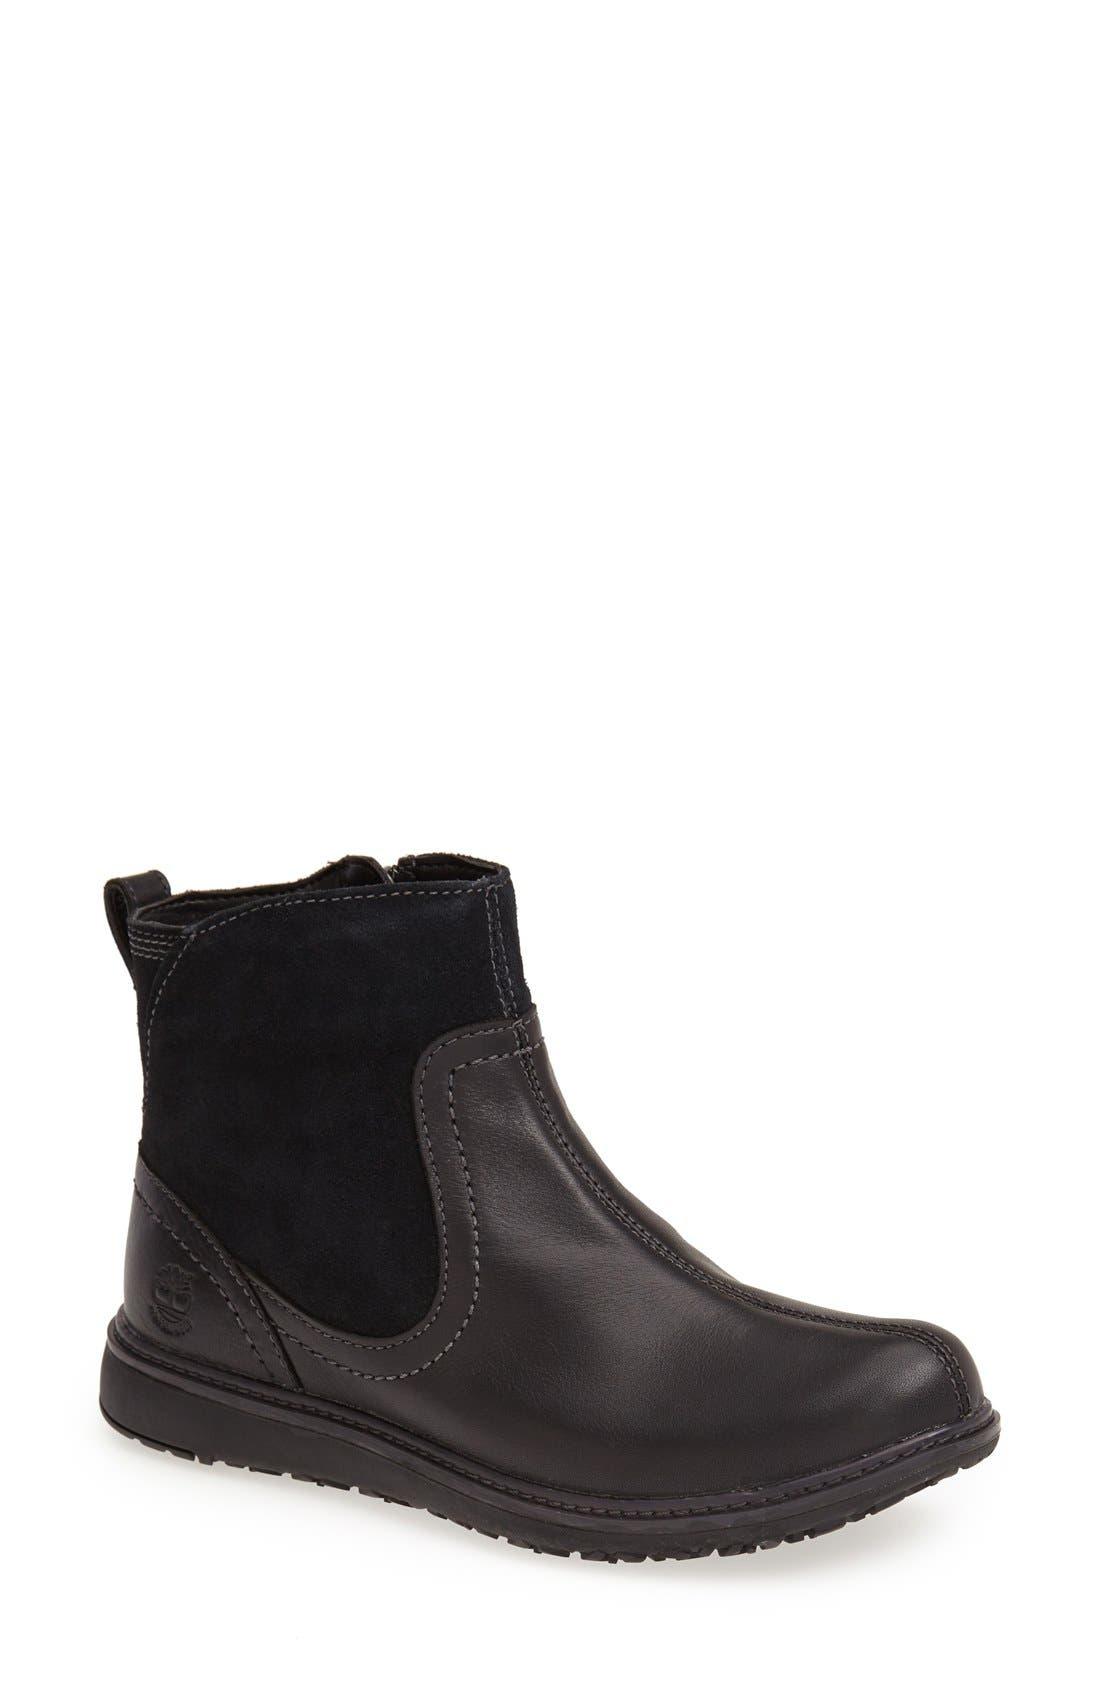 Main Image - Timberland Earthkeepers® 'Ashdale' Waterproof Ankle Boot (Women)